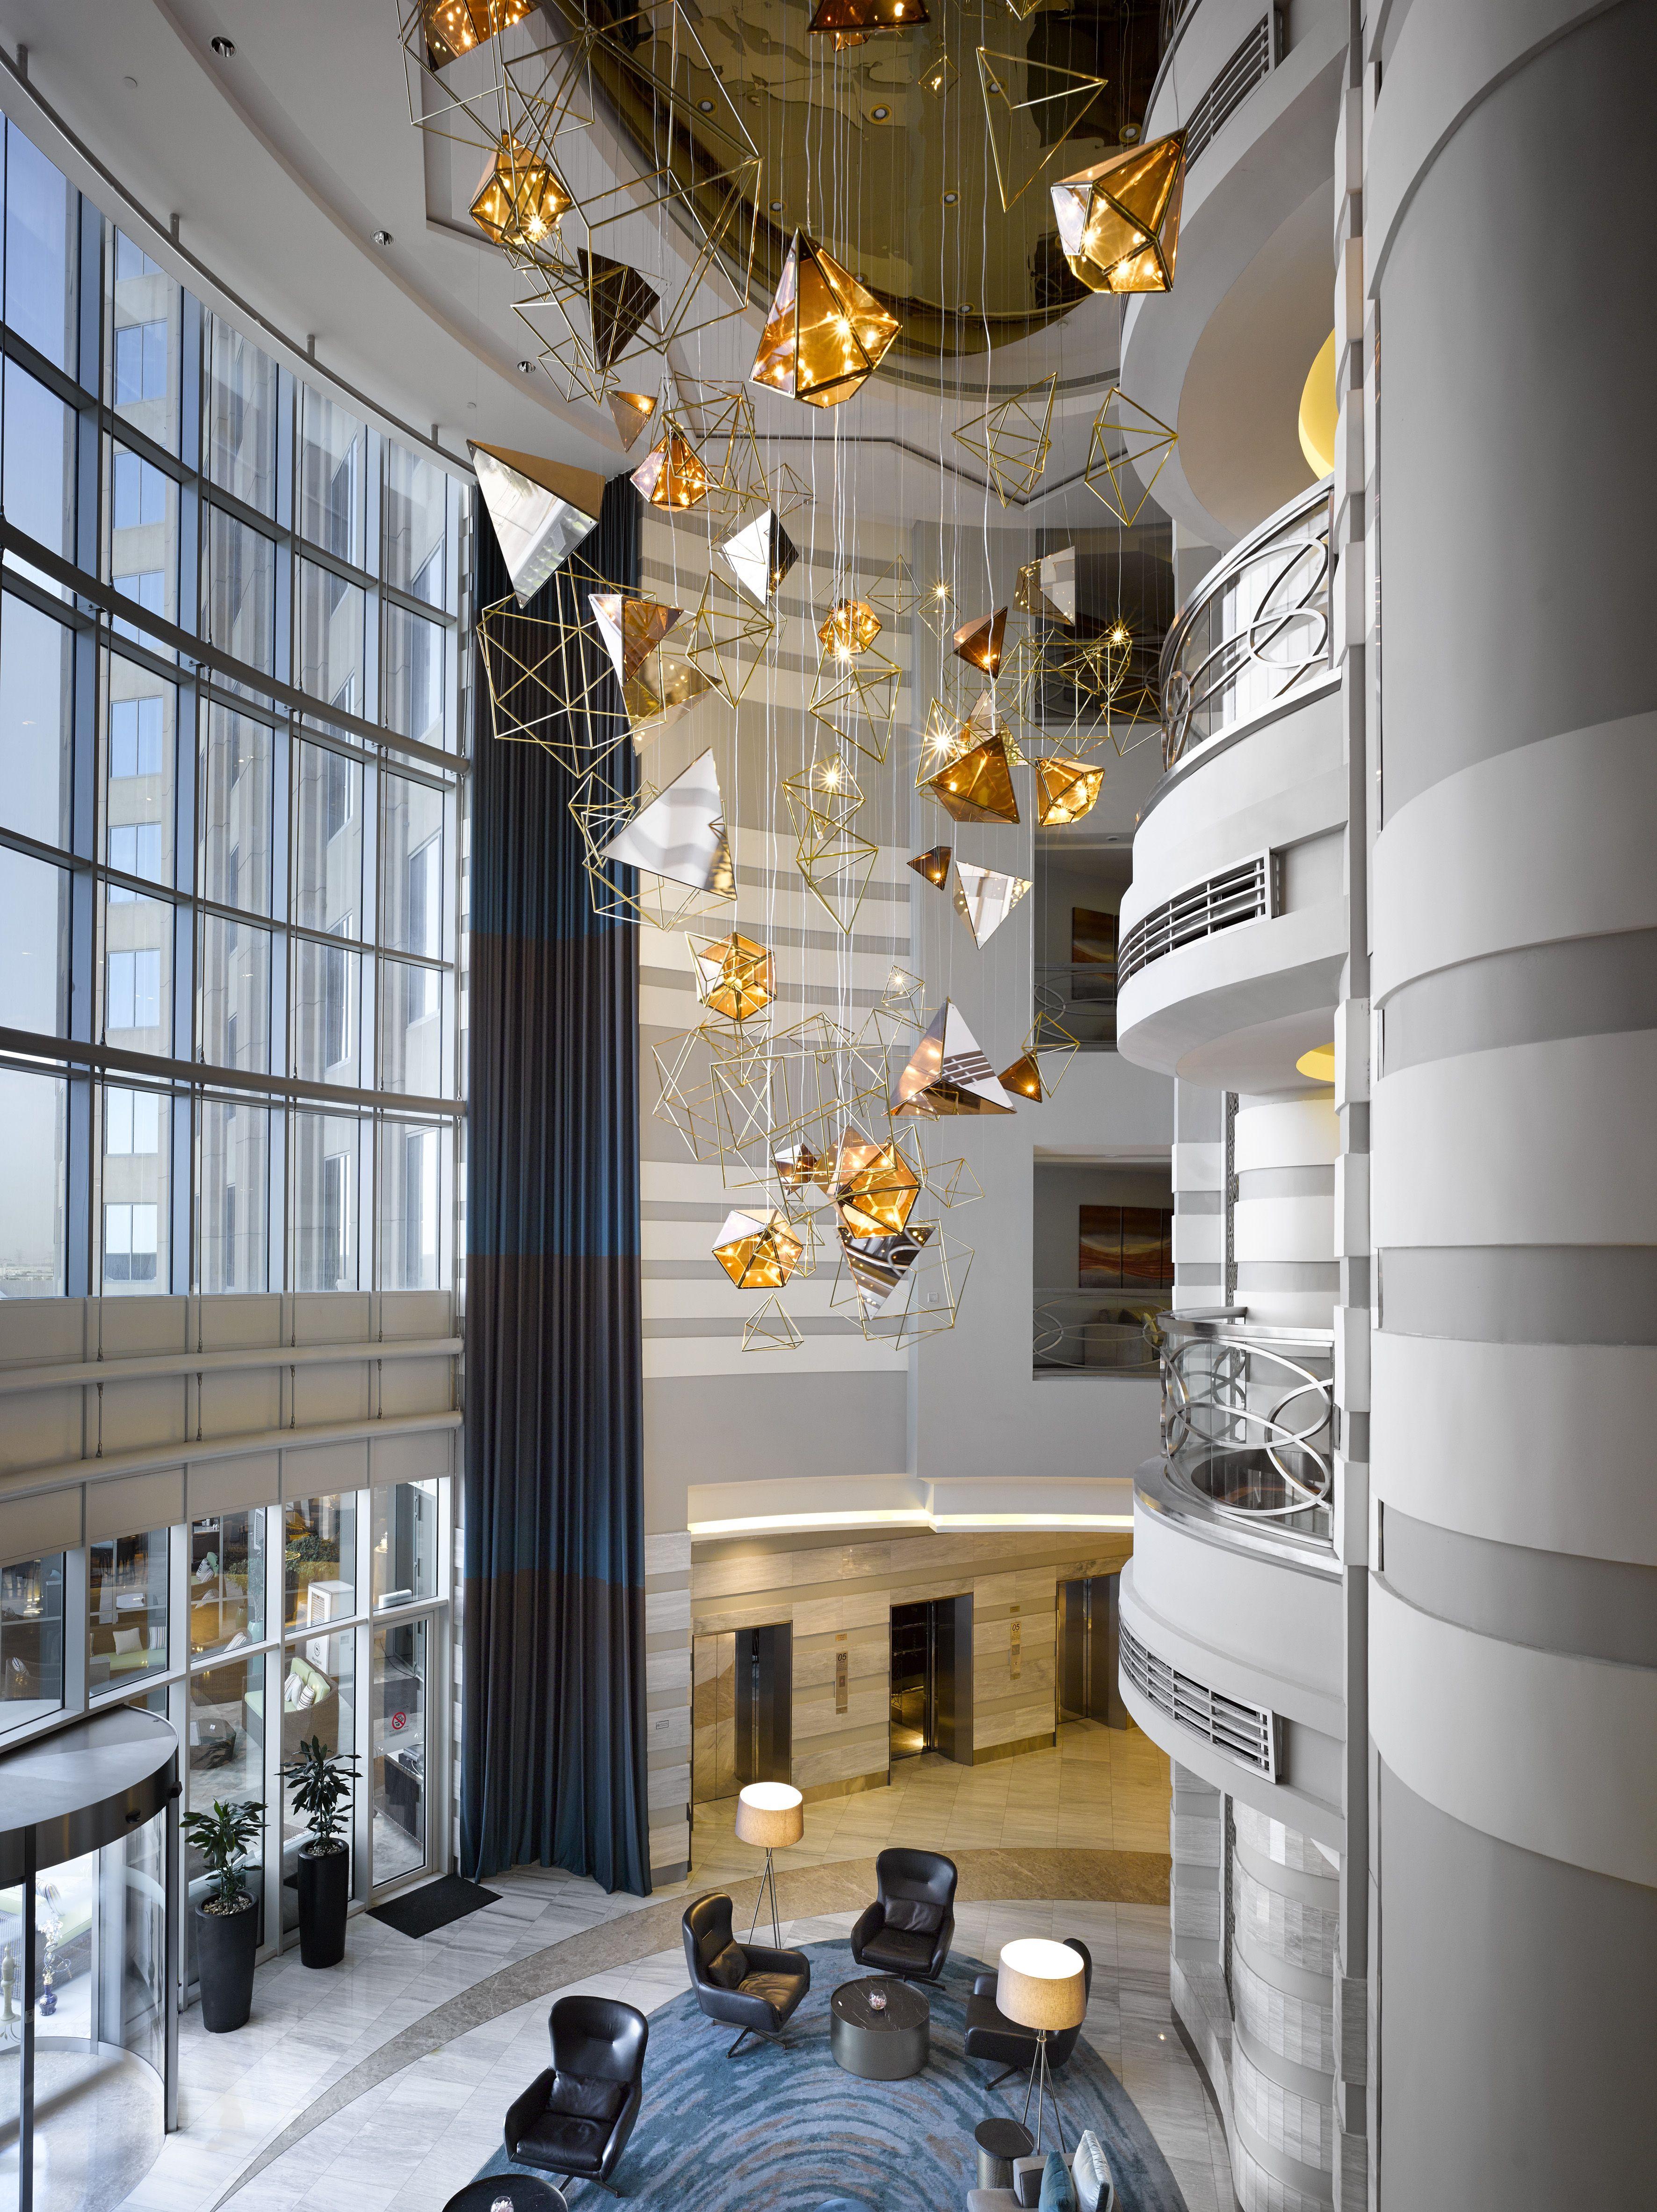 dubai designs lighting lamps luxury antonovich the biggest lighting installation in the sheraton dubai mall of emiratesu2026